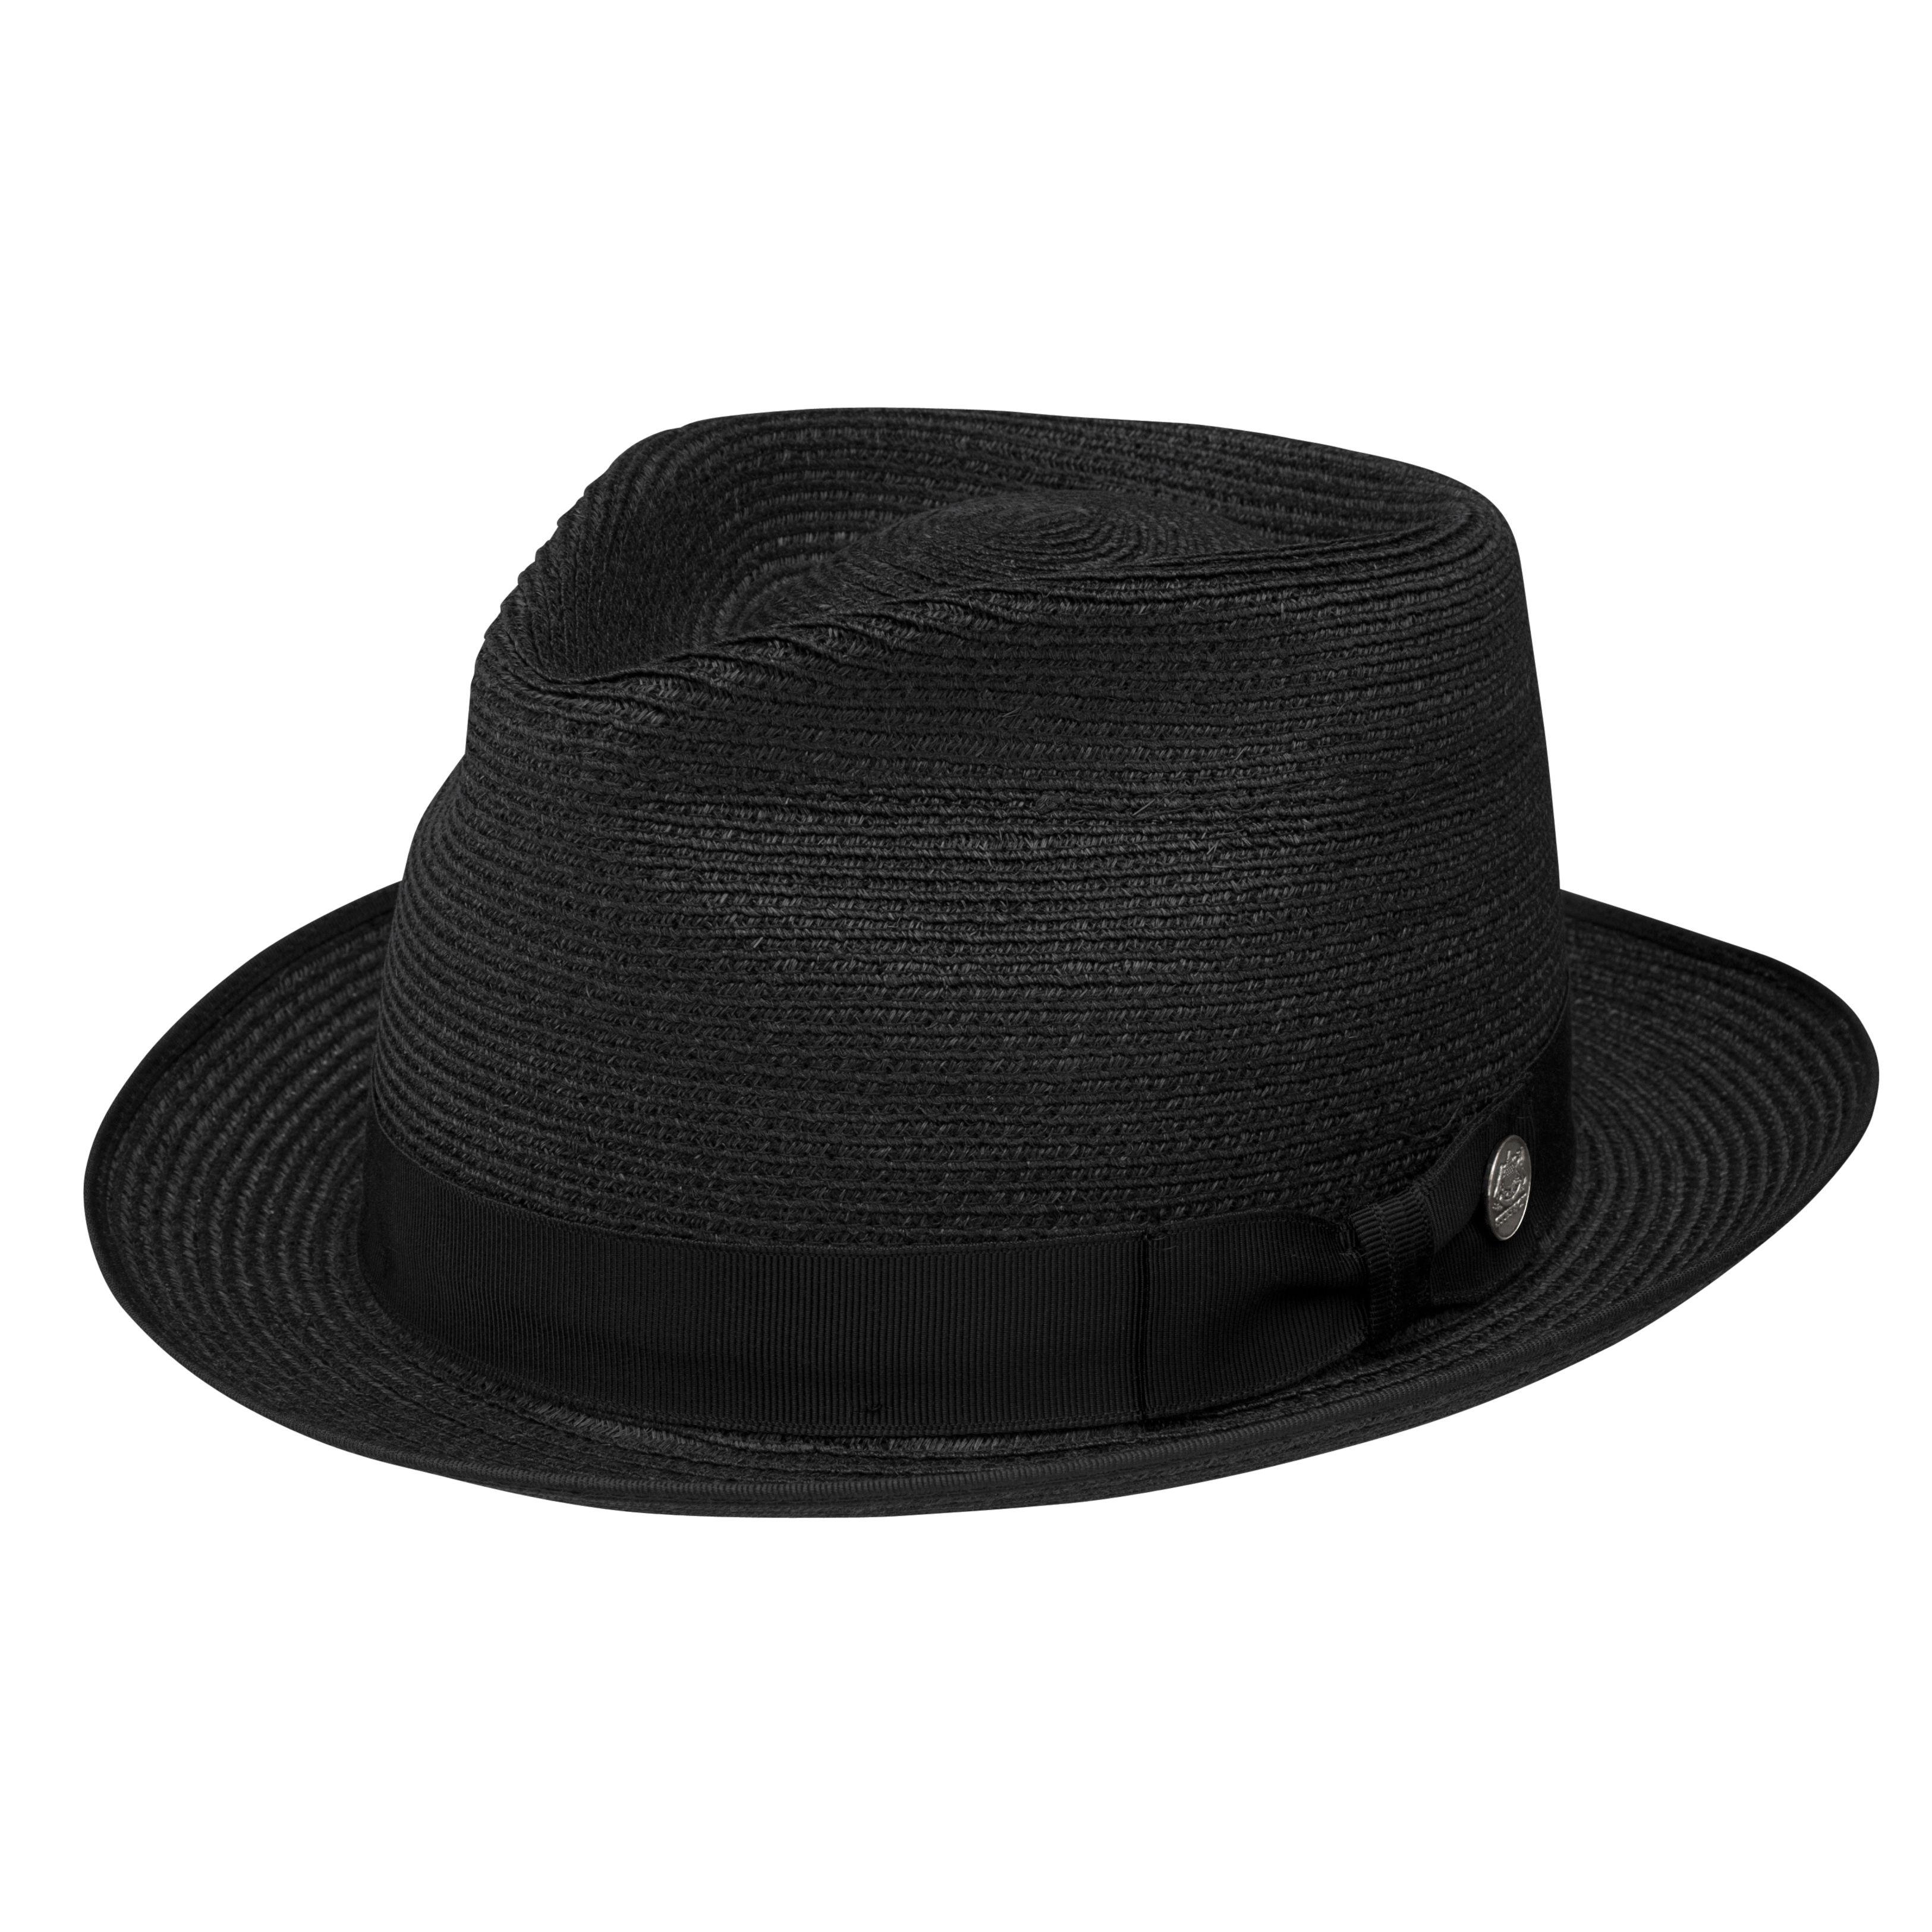 ... Western Wear and more! Inwood baa6888c1957